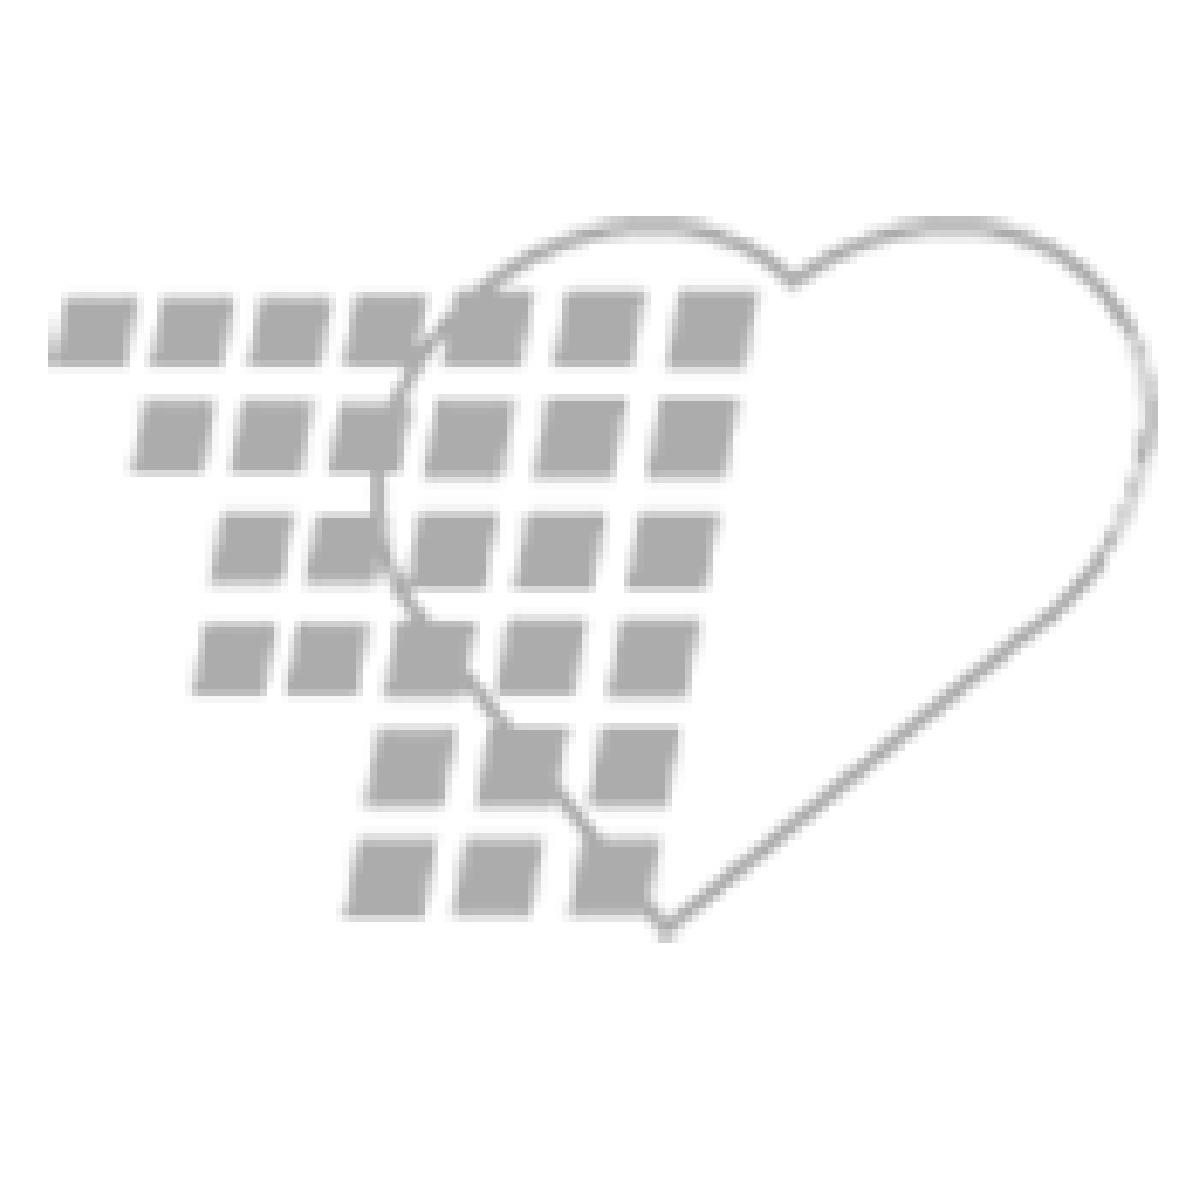 02-43-5341 Welch Allyn CP150 Office Cart